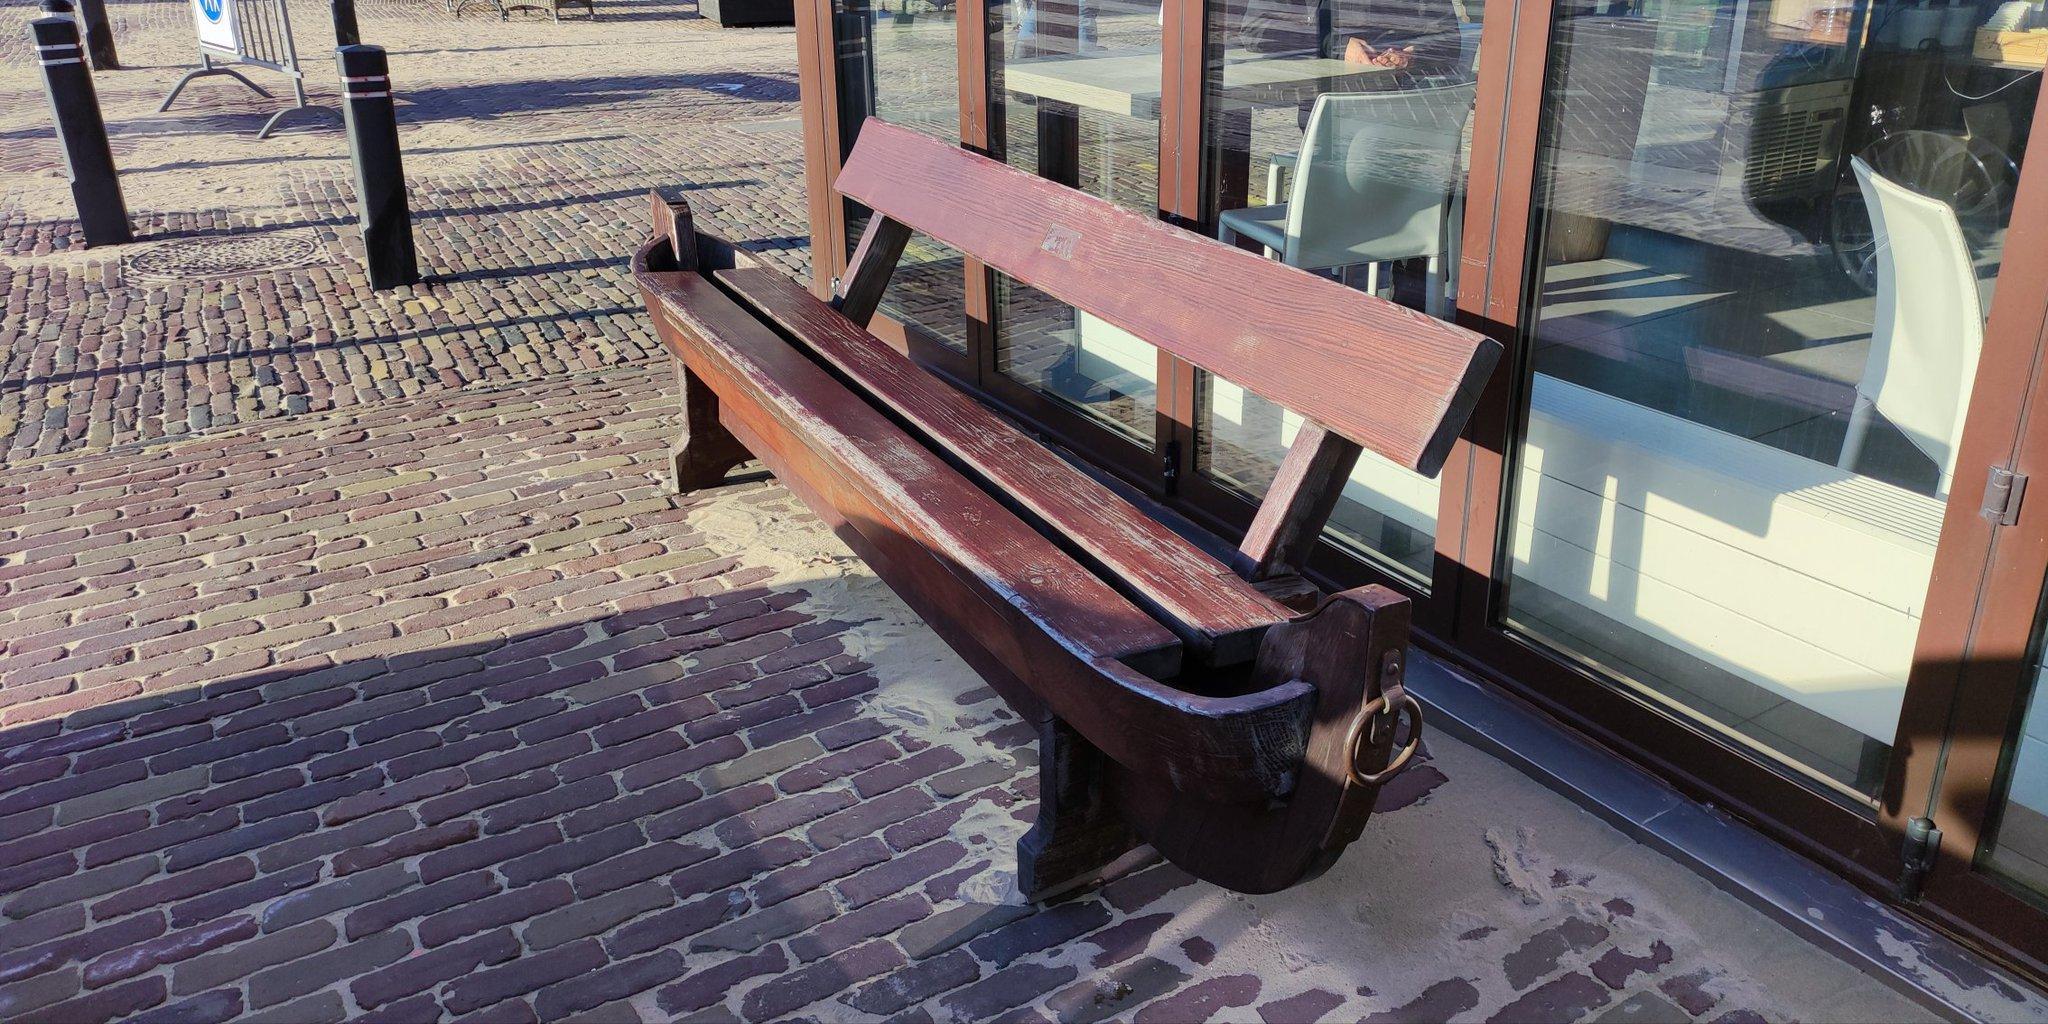 rt-bouncerbobb-wandelbankjes-karingibcus-leuk-bankie-egmond-aan-zee-https-t-co-tvryiurjgy